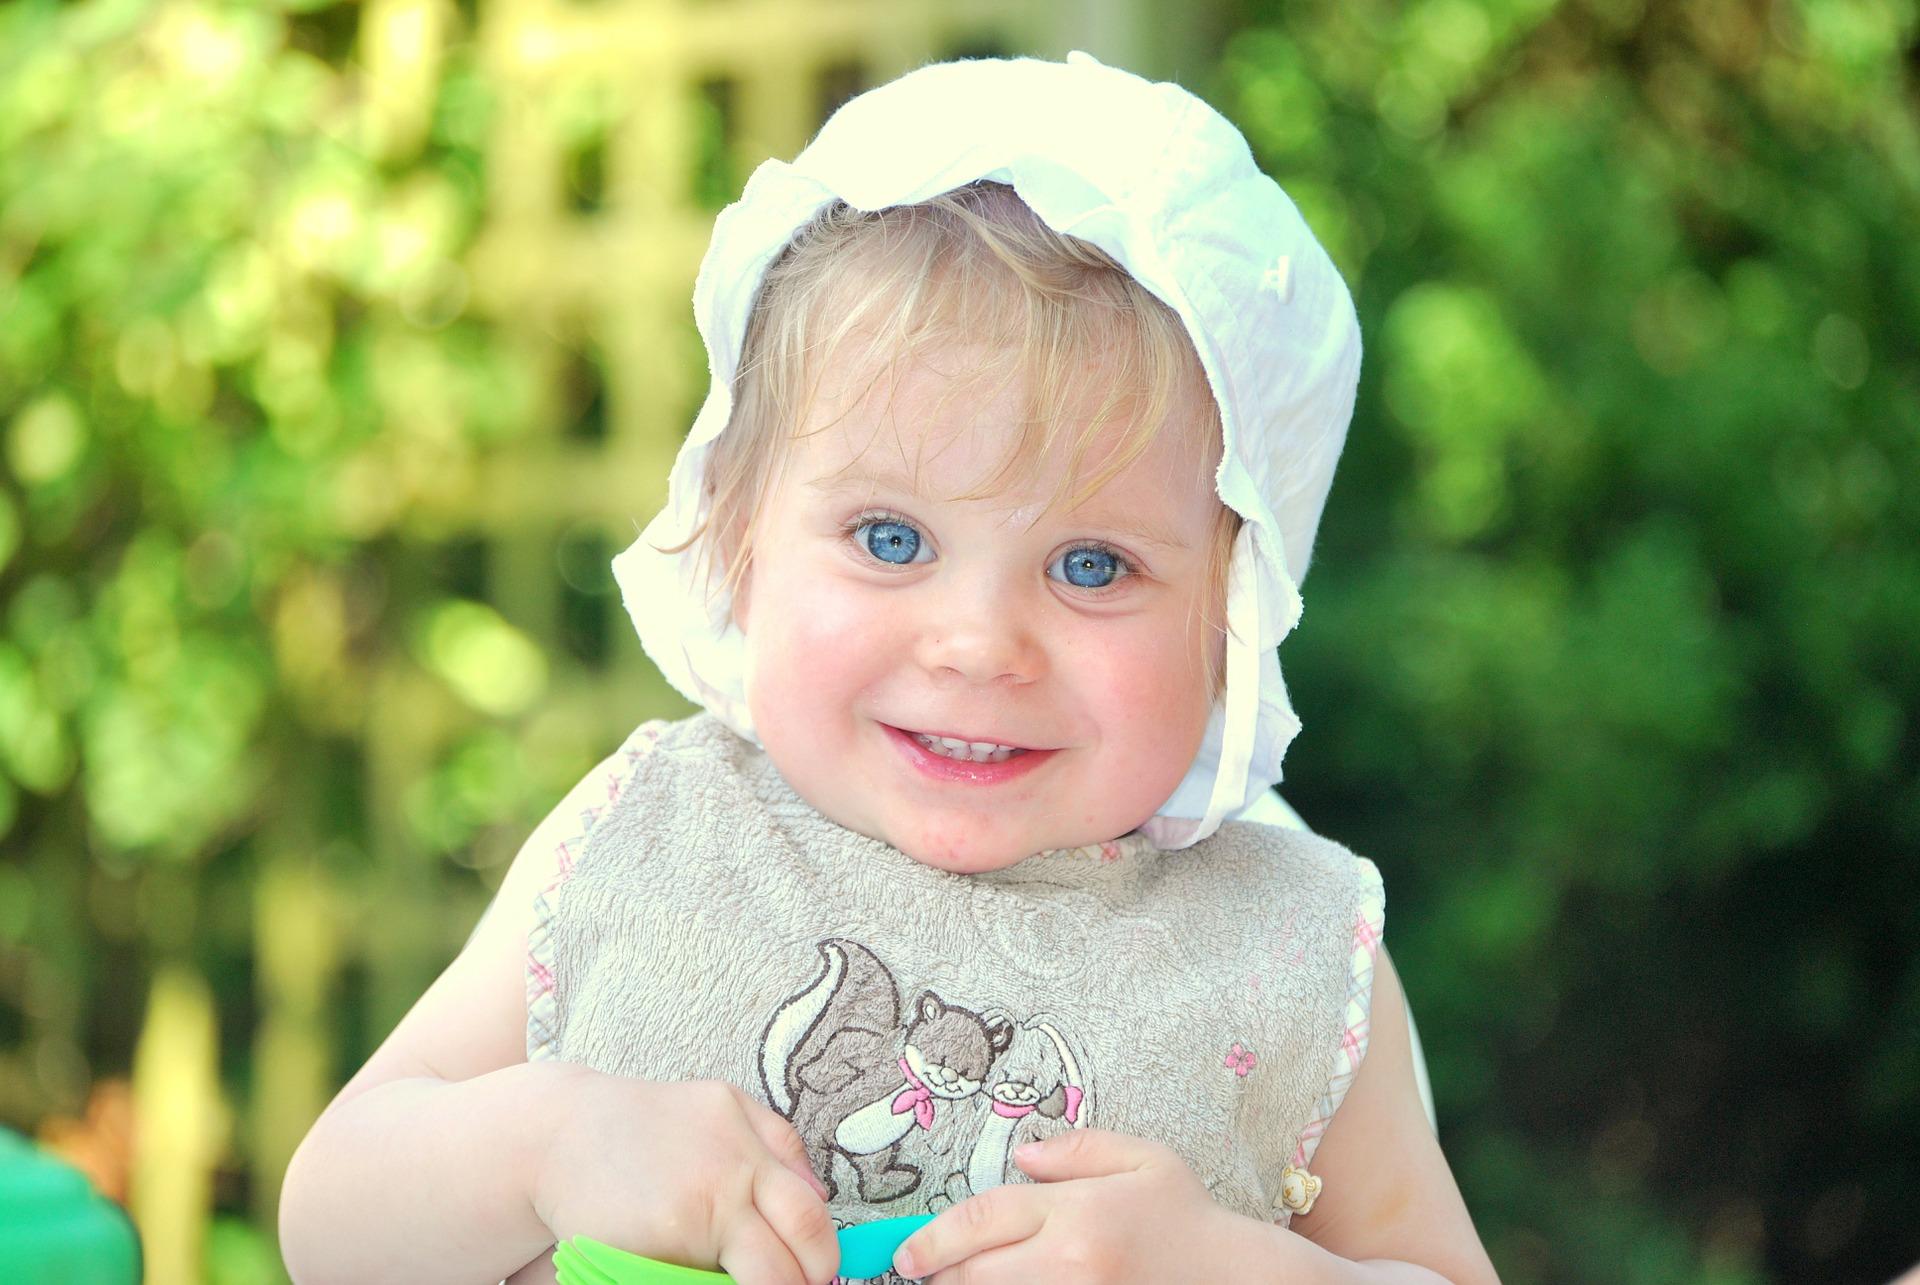 Bolile bebelușului